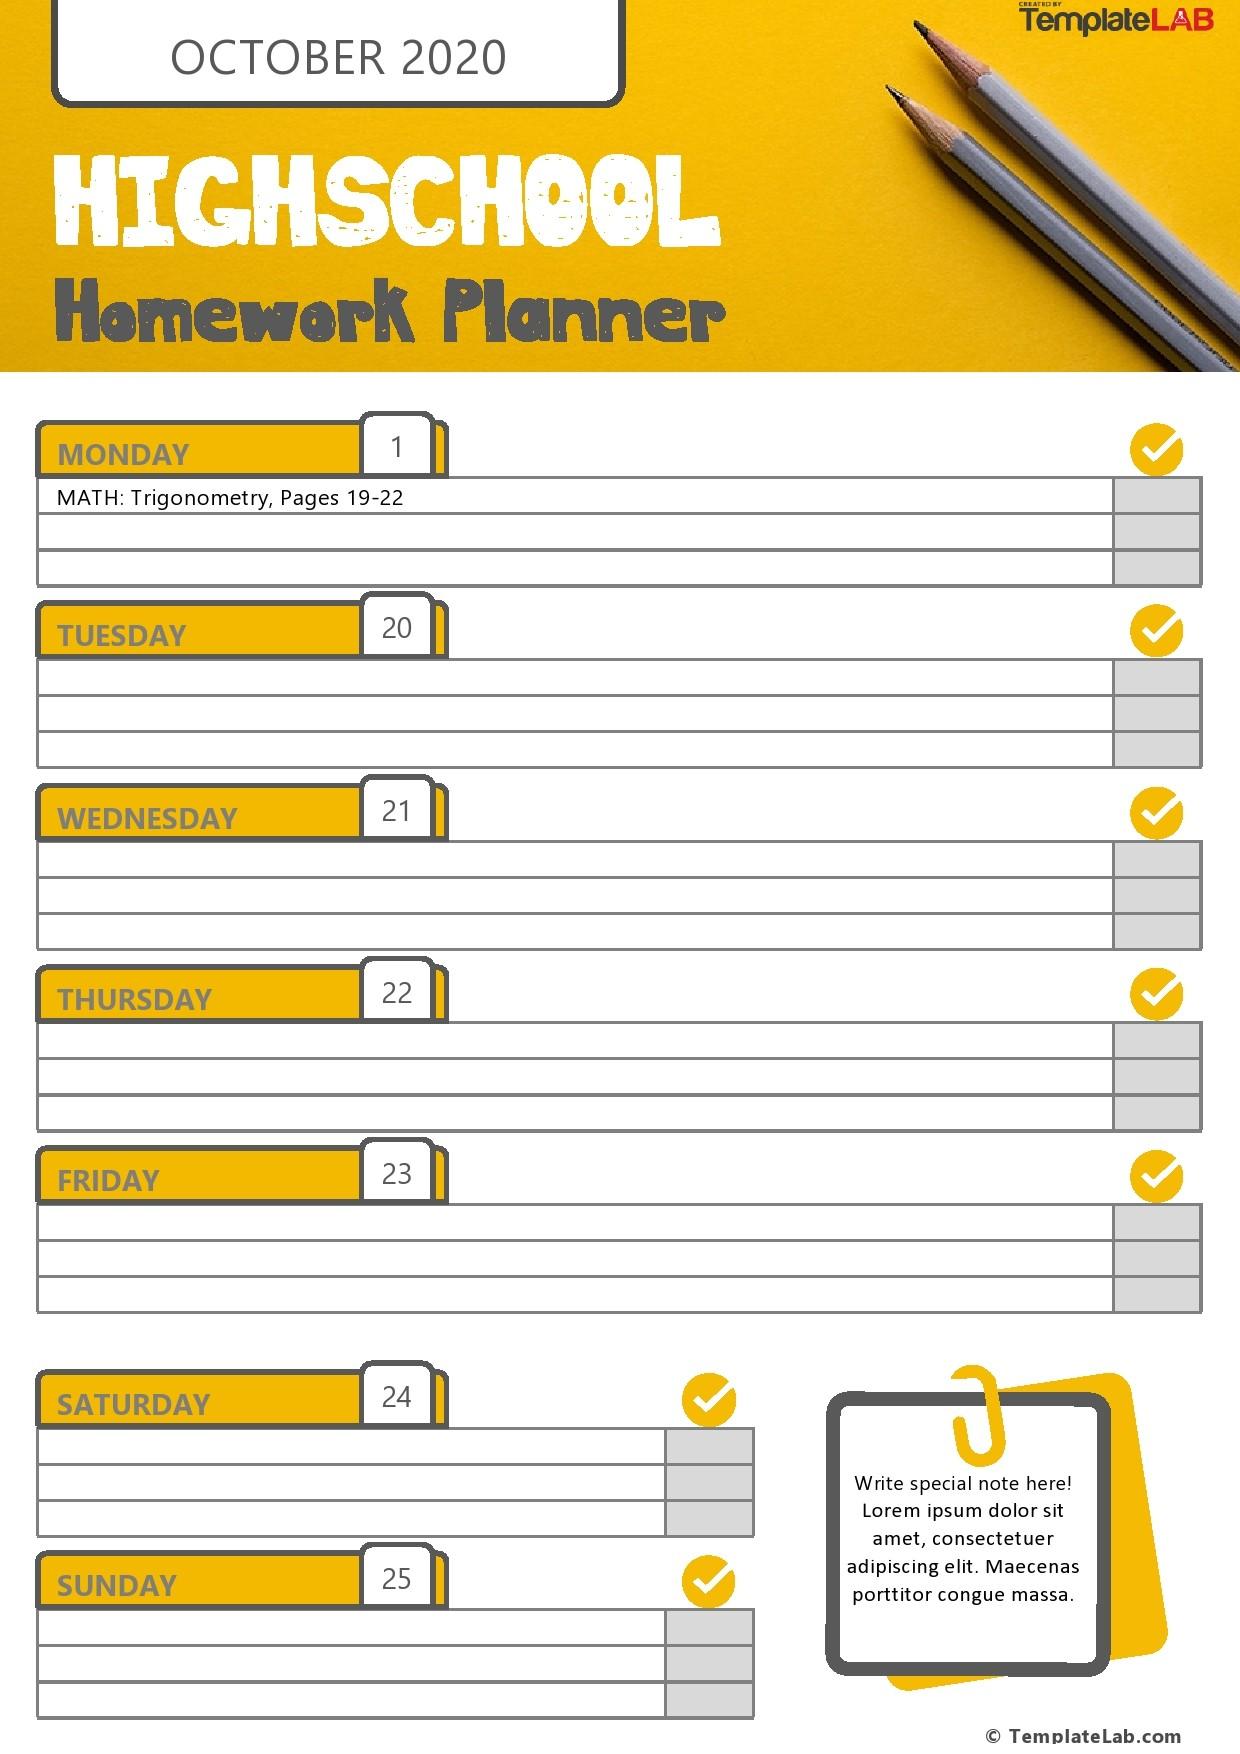 Free Highschool Homework Planner Template - TemplateLab.com